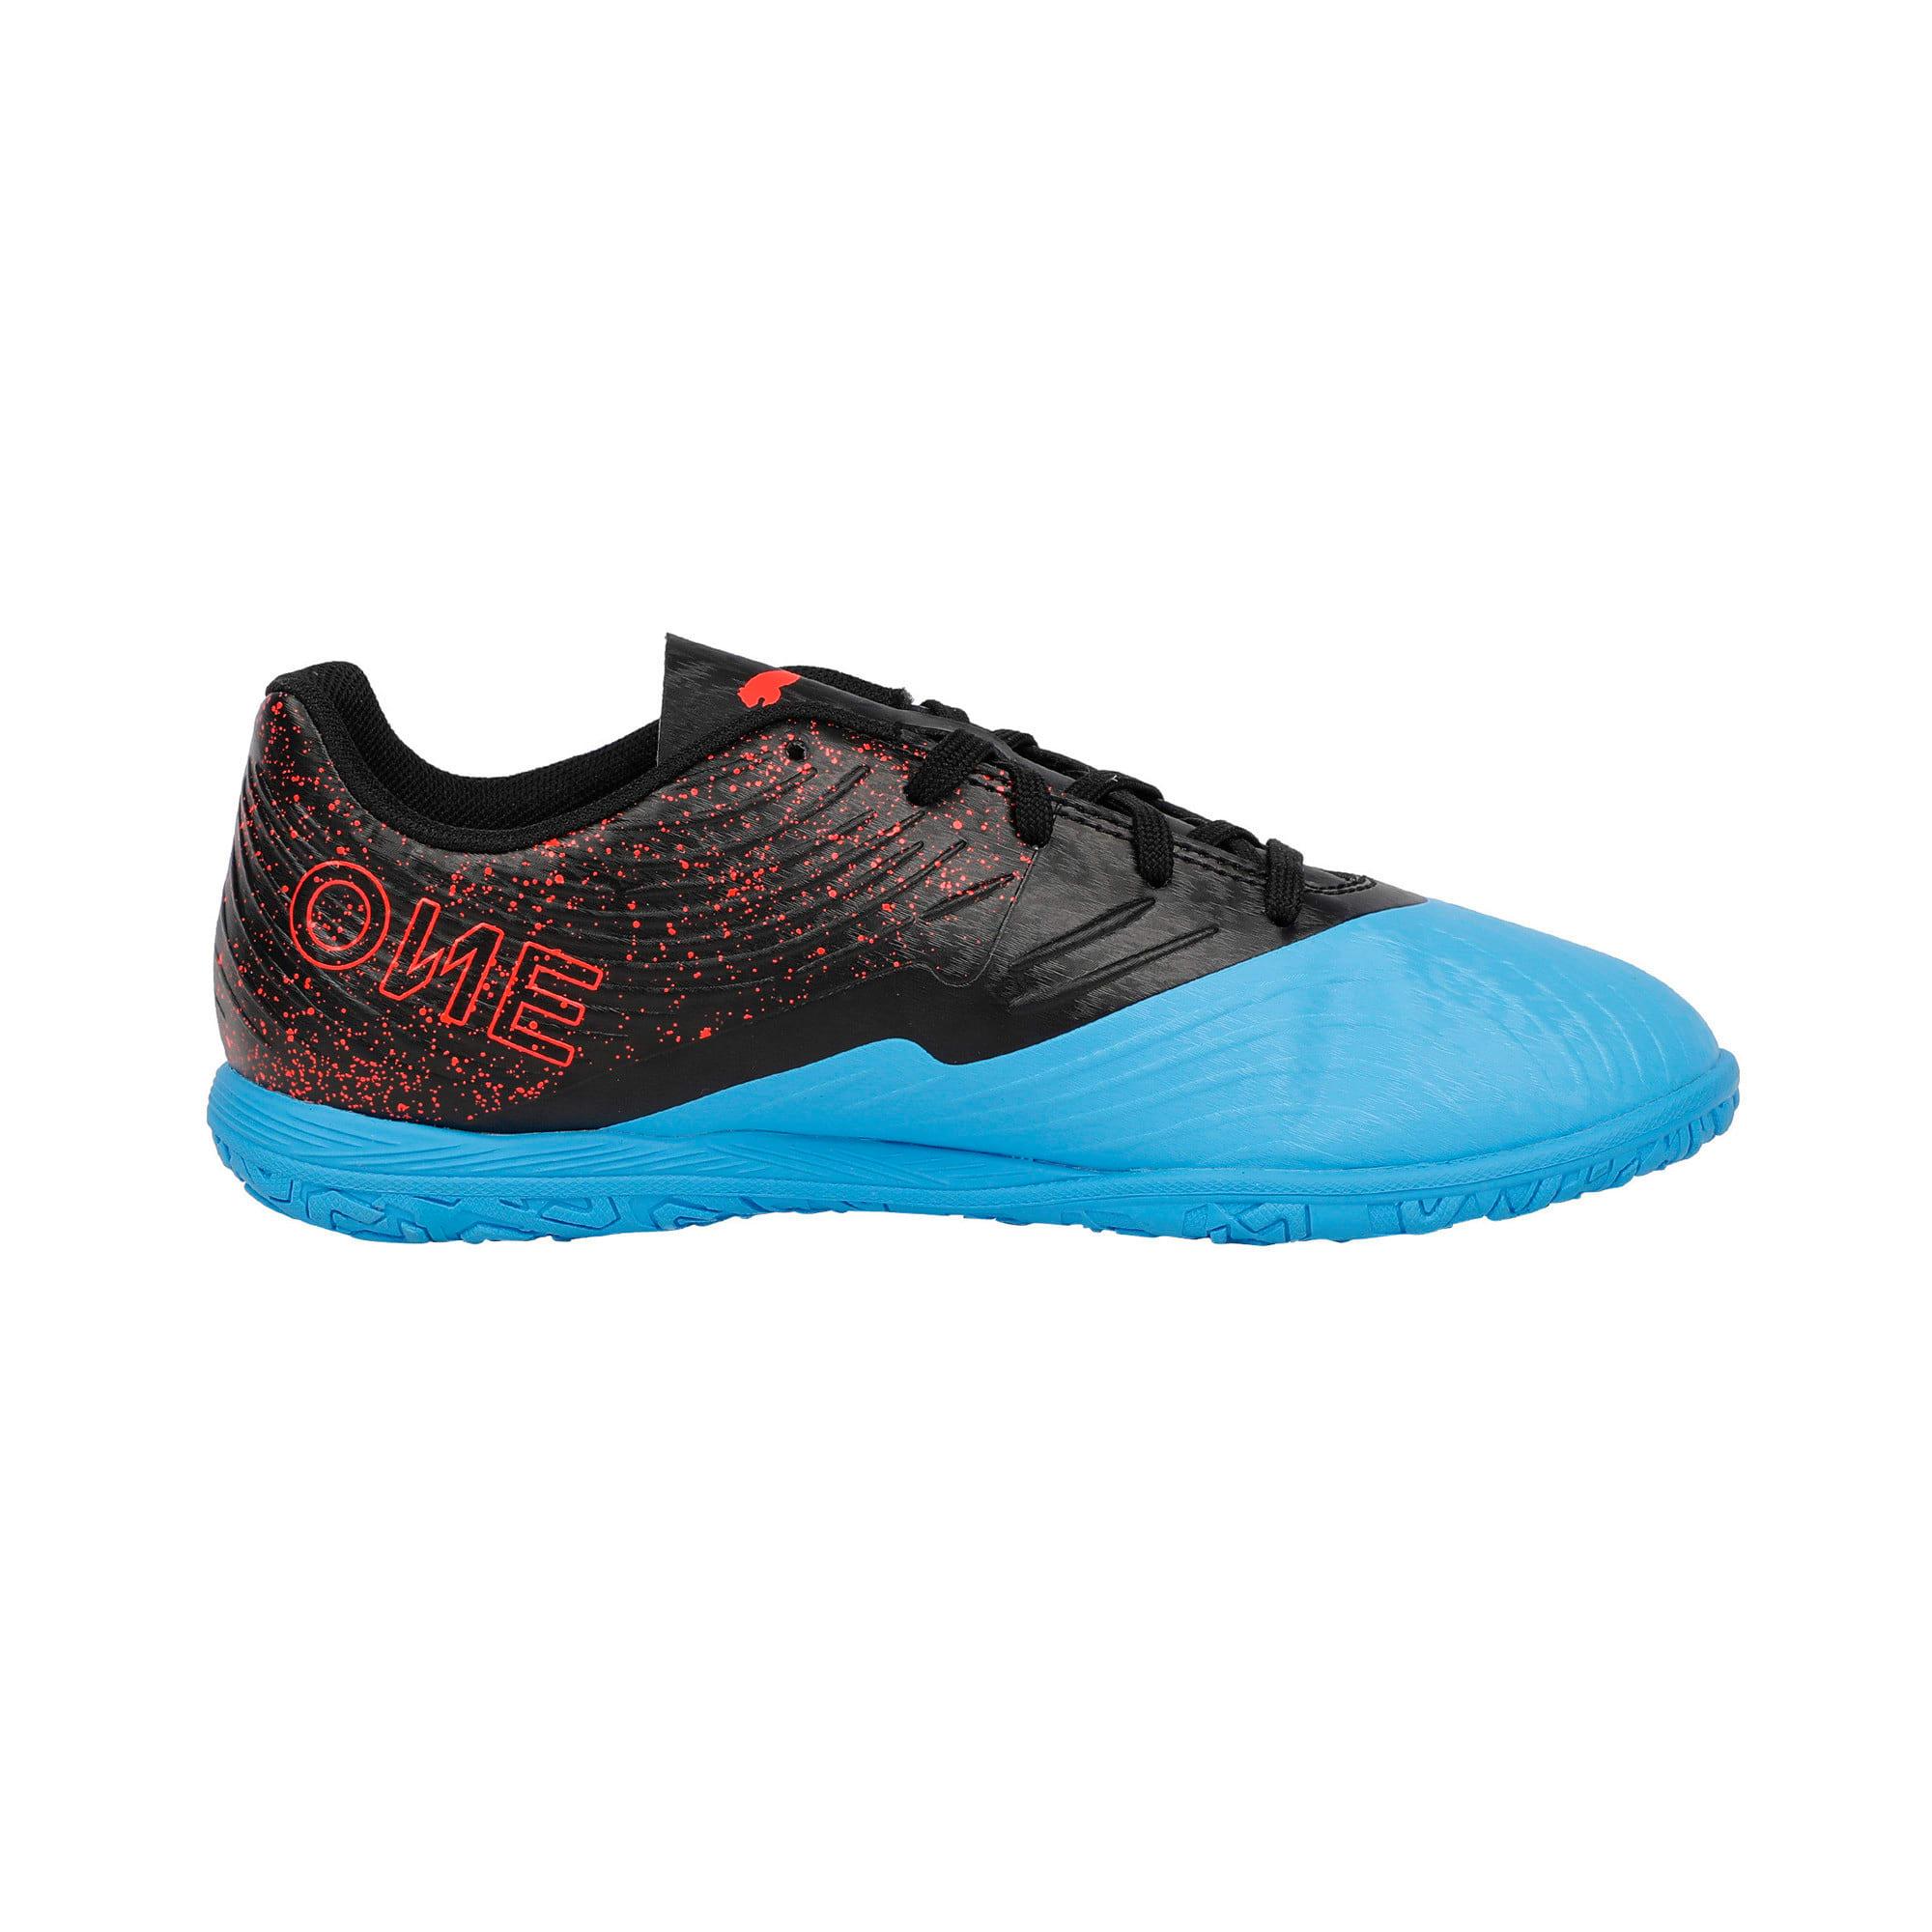 Thumbnail 5 of PUMA ONE 19.4 IT Youth Football Boots, Bleu Azur-Red Blast-Black, medium-IND